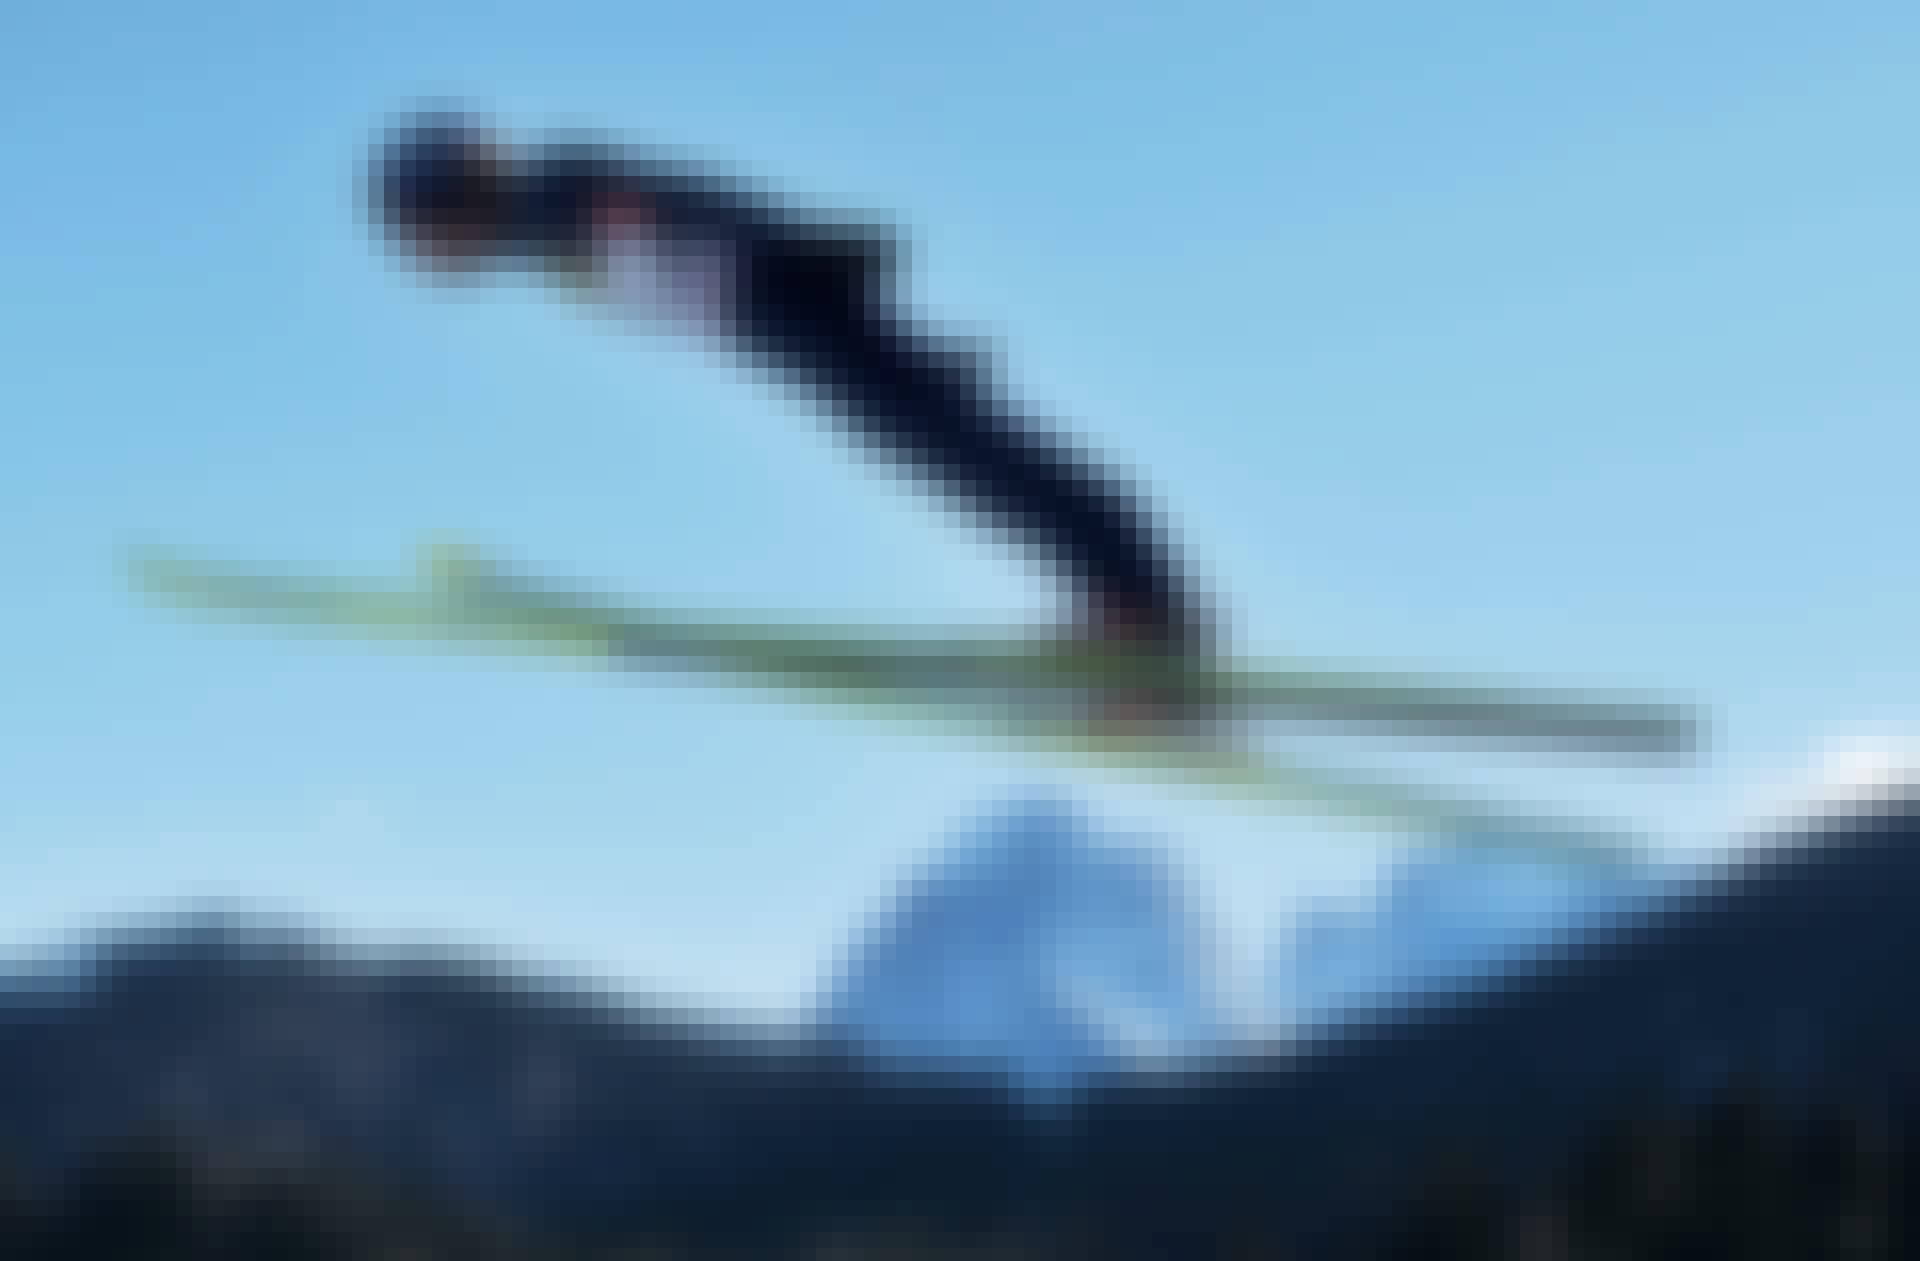 Skihopper